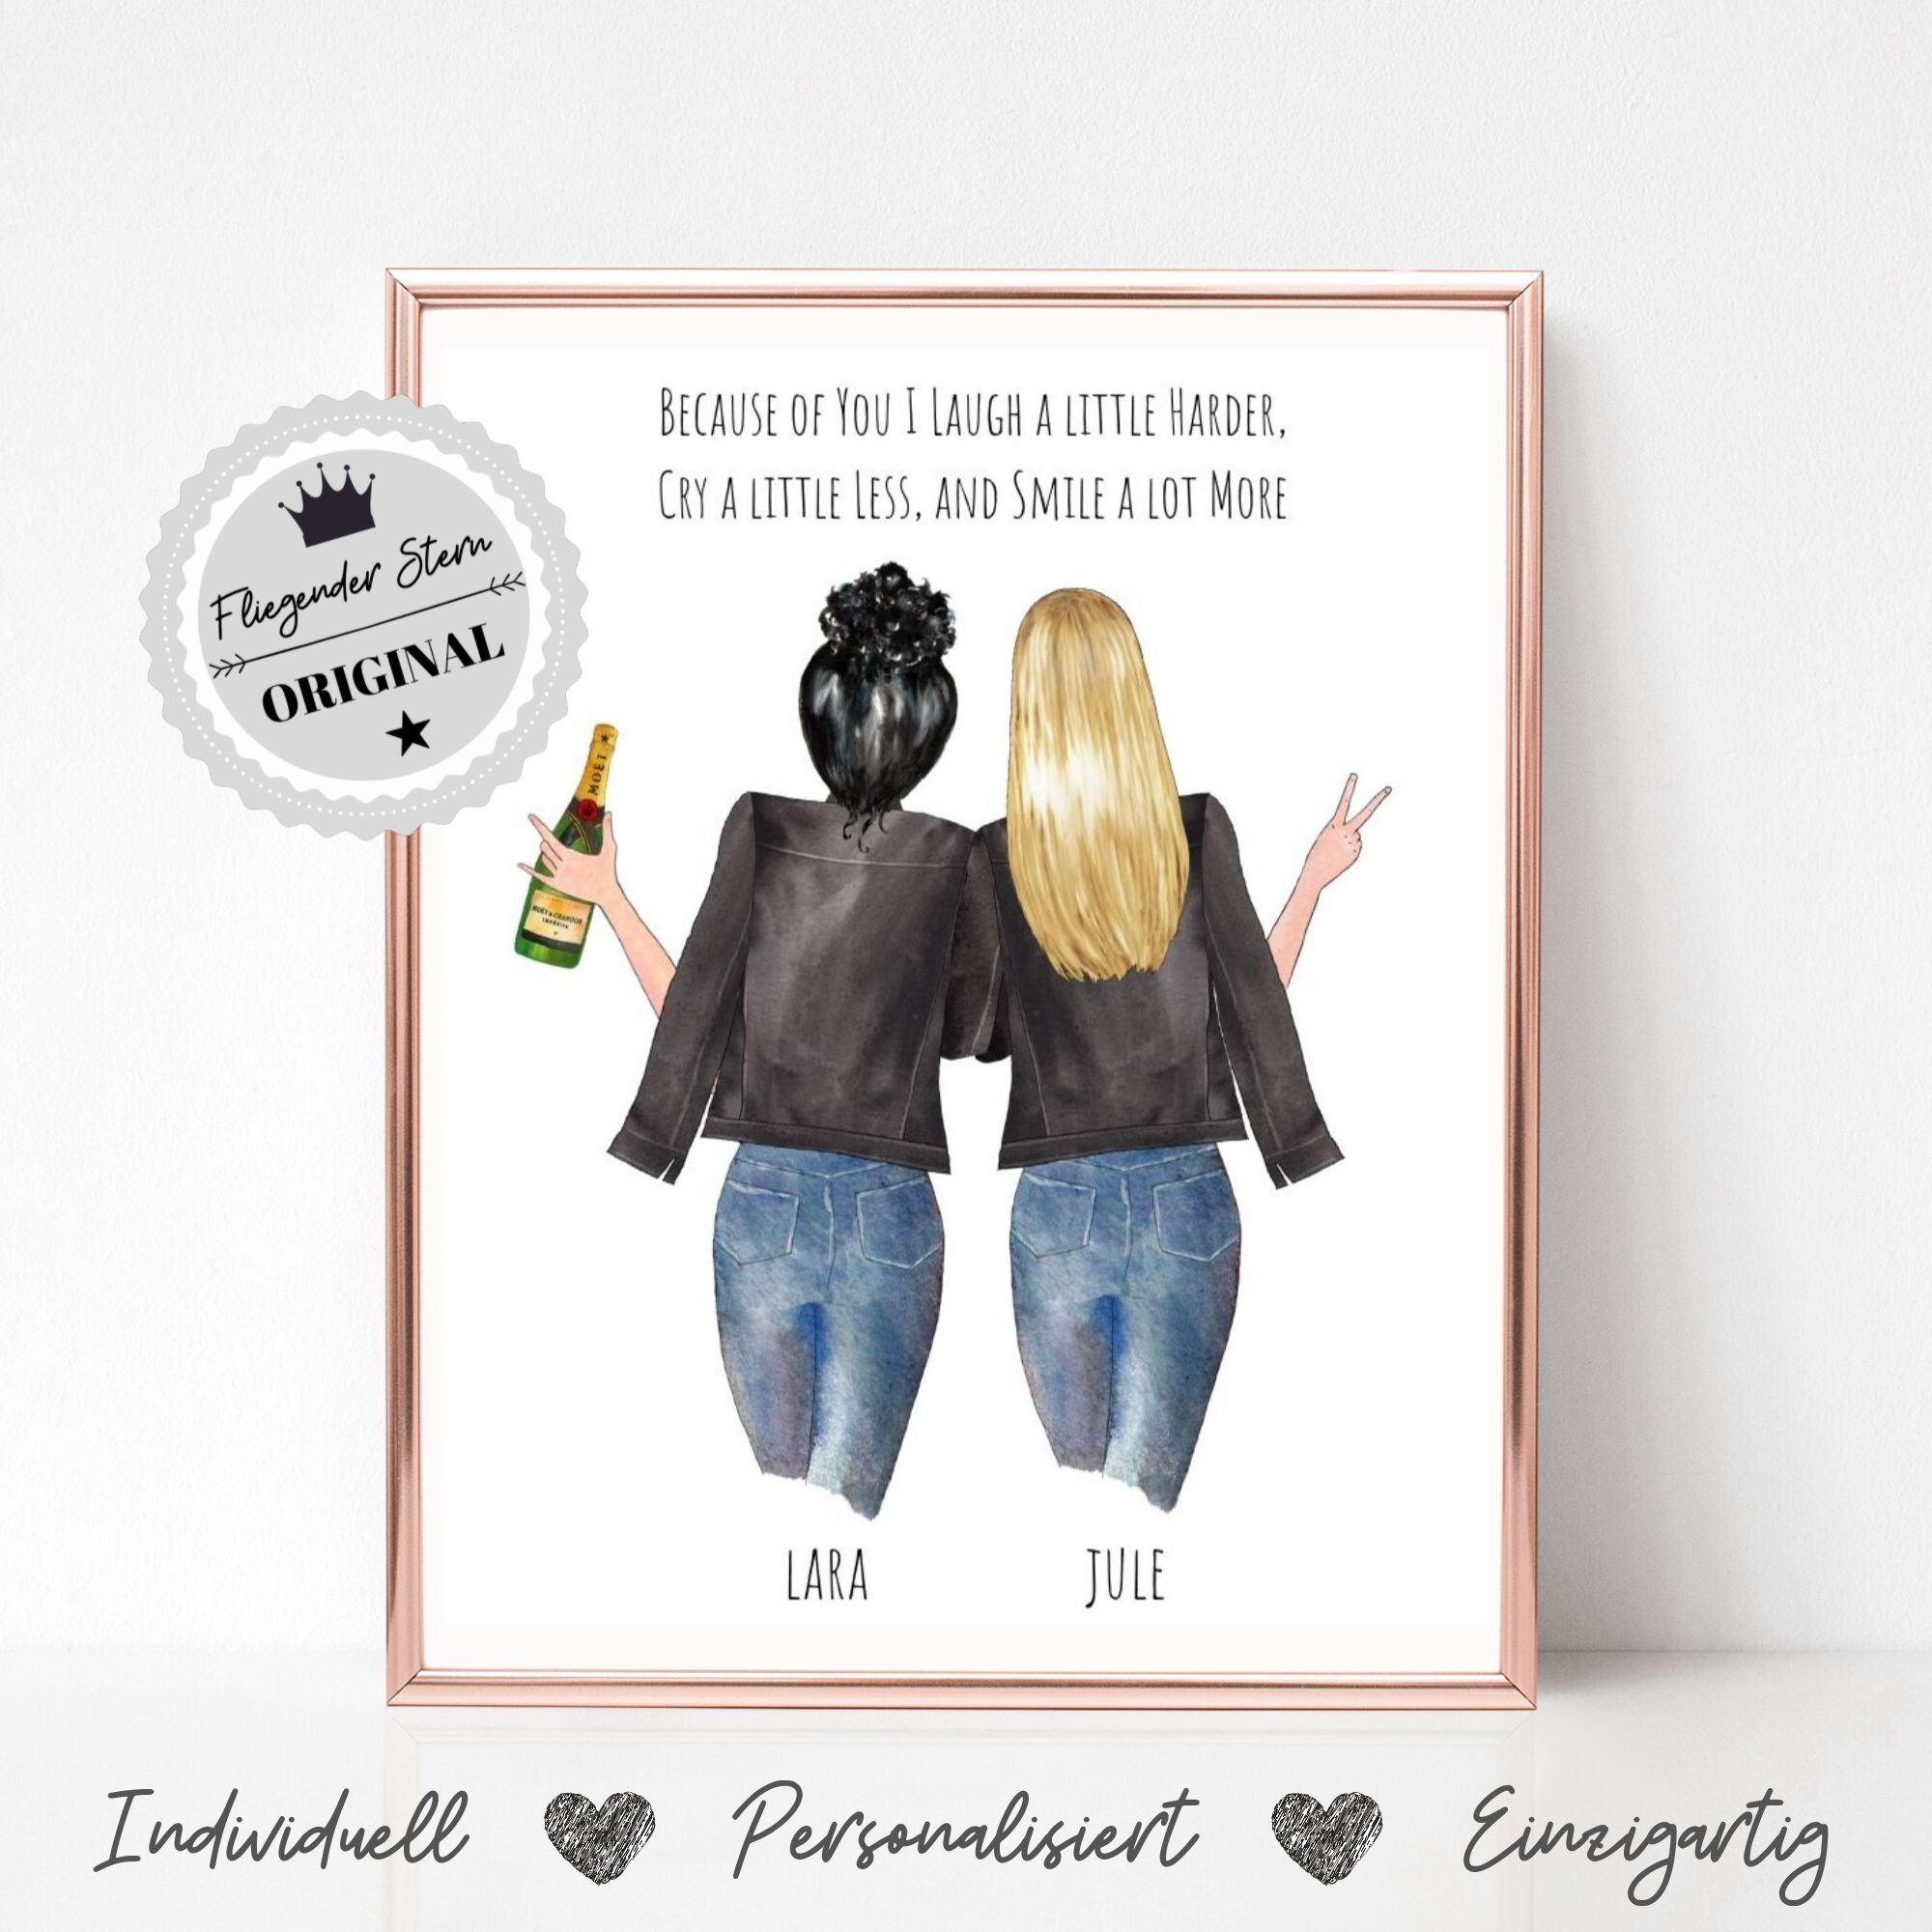 Geschenk beste Freundin | Beste Freundin Geburtstag | Geschenkidee | Freundin Bild | Schwester Geschenkidee | Geschenkideen Freundin Poster #personalisiertegeschenke